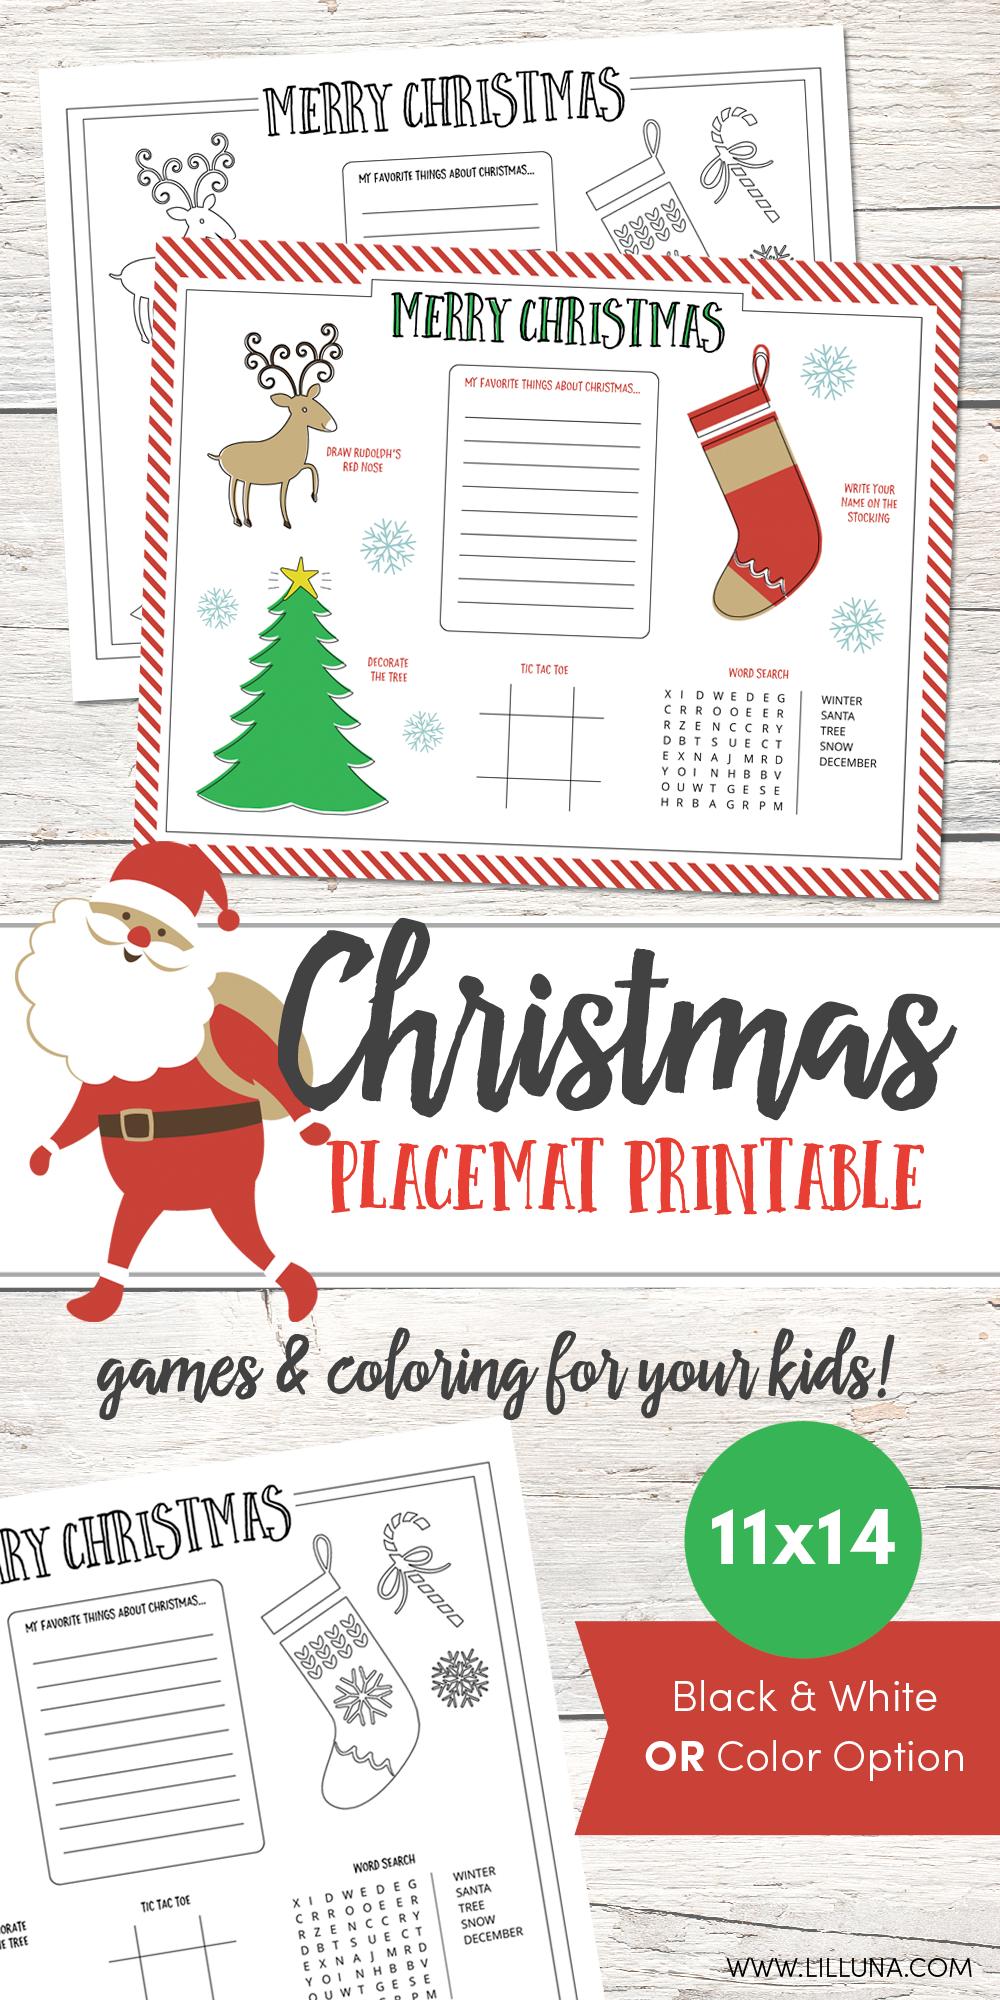 Christmas Placemat Printable - Lil' Luna - Free Printable Christmas Placemats For Adults